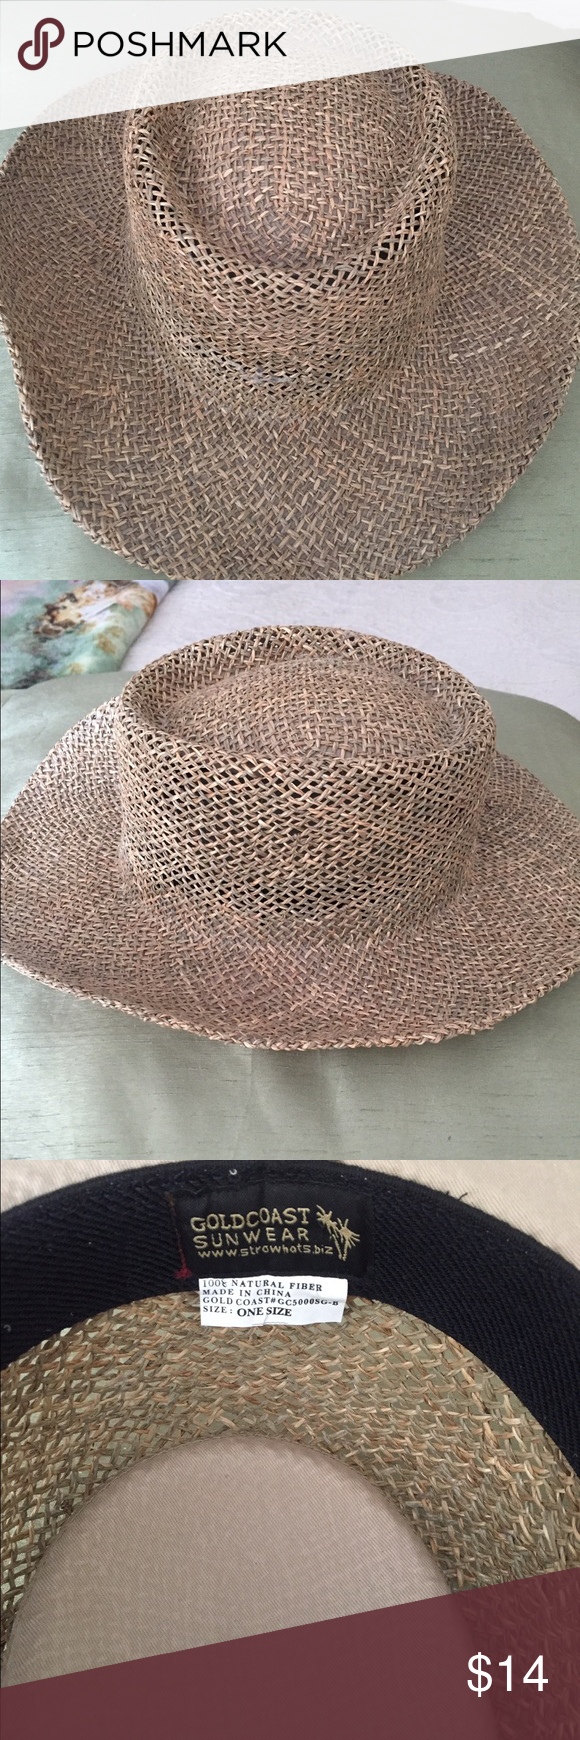 025f1e52e0707 GOLDCOAST Sunwear 100% natural straw hat GOLDCOAST 100% natural straw sun  hat. Great